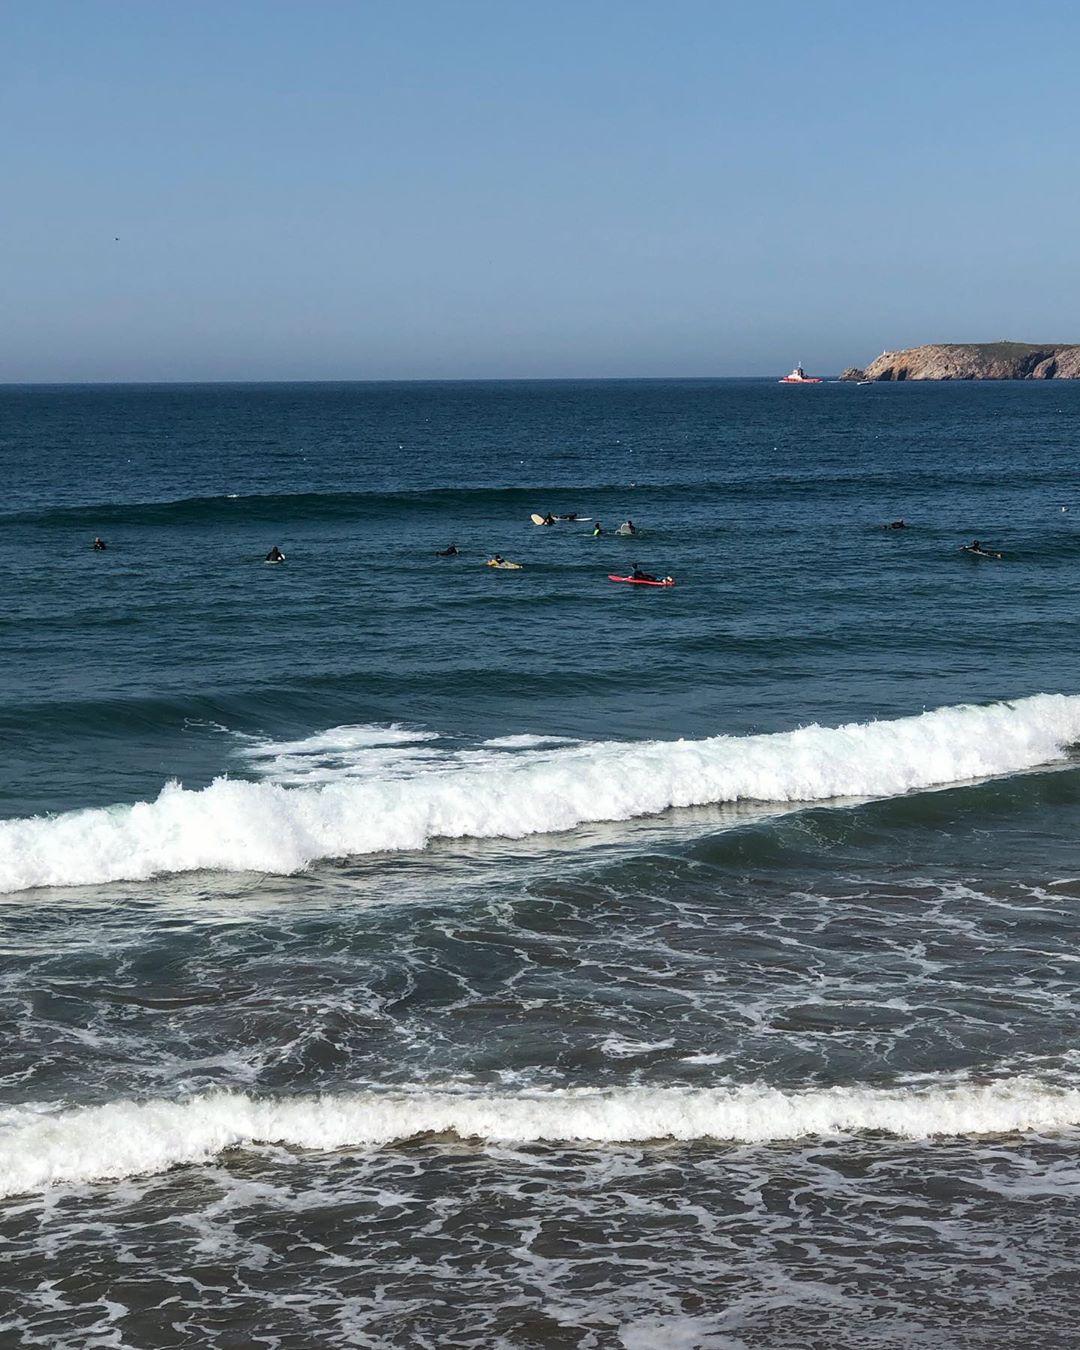 Todos al agua, momento surf - Todos Al Agua, Momento Surf